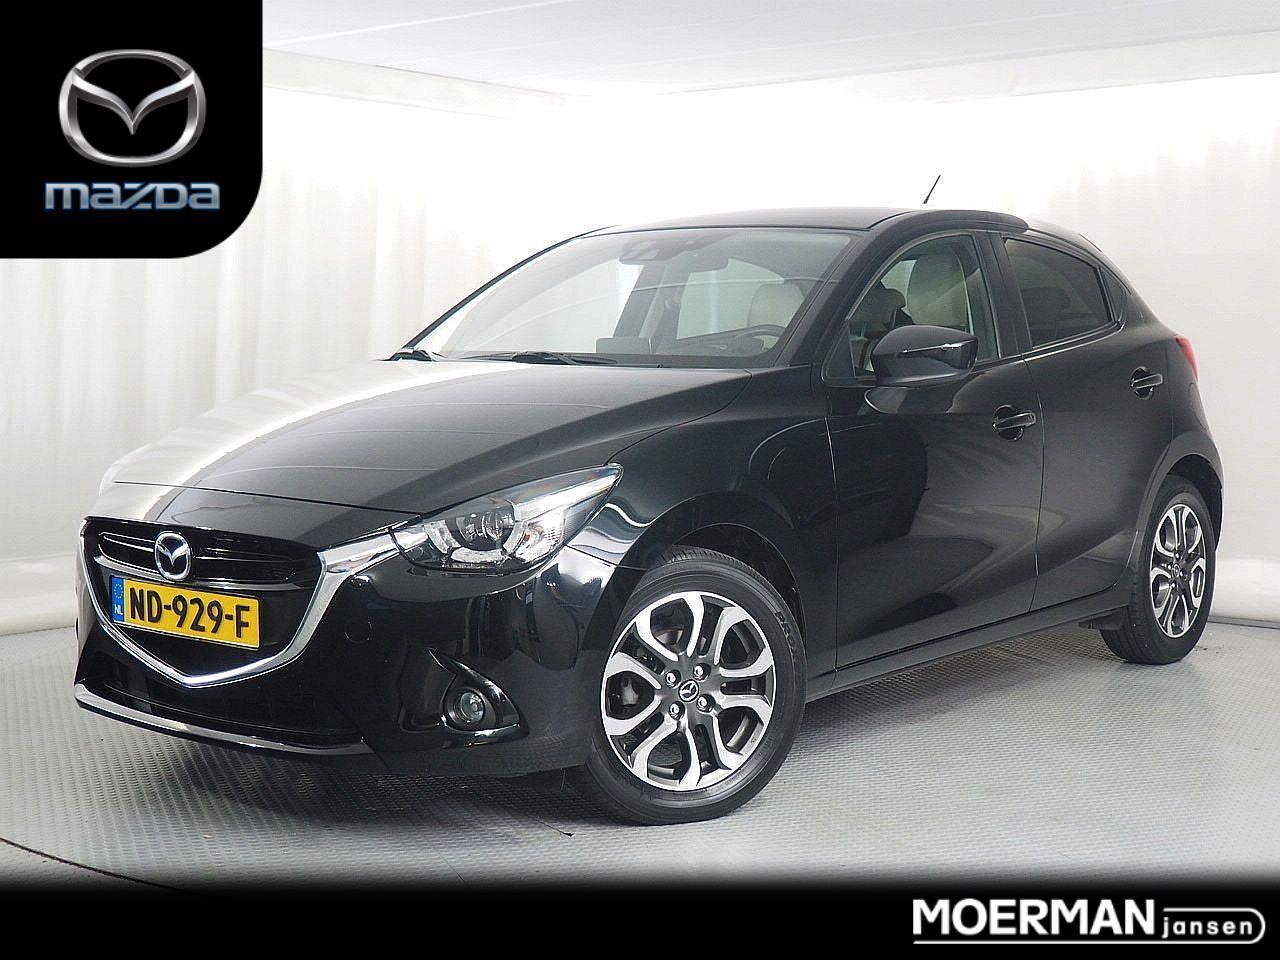 Mazda 2 1.5 luxus gt / 1e eigenaar / wit leder / head-up display / cruise control / 21.000km